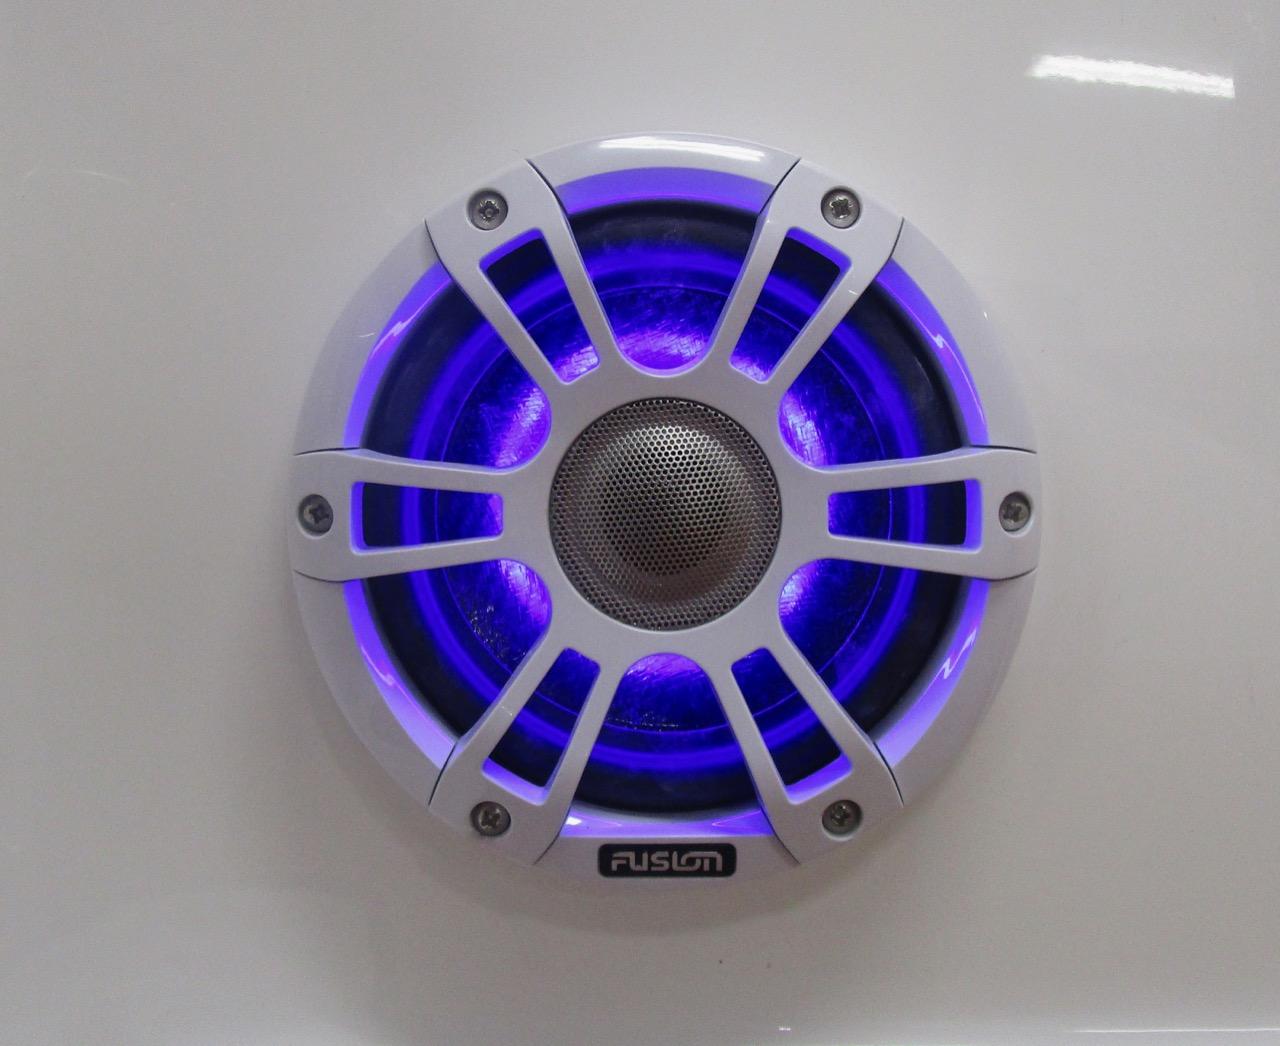 GRAND G850 RIB  one of four Fusion Signature speakers